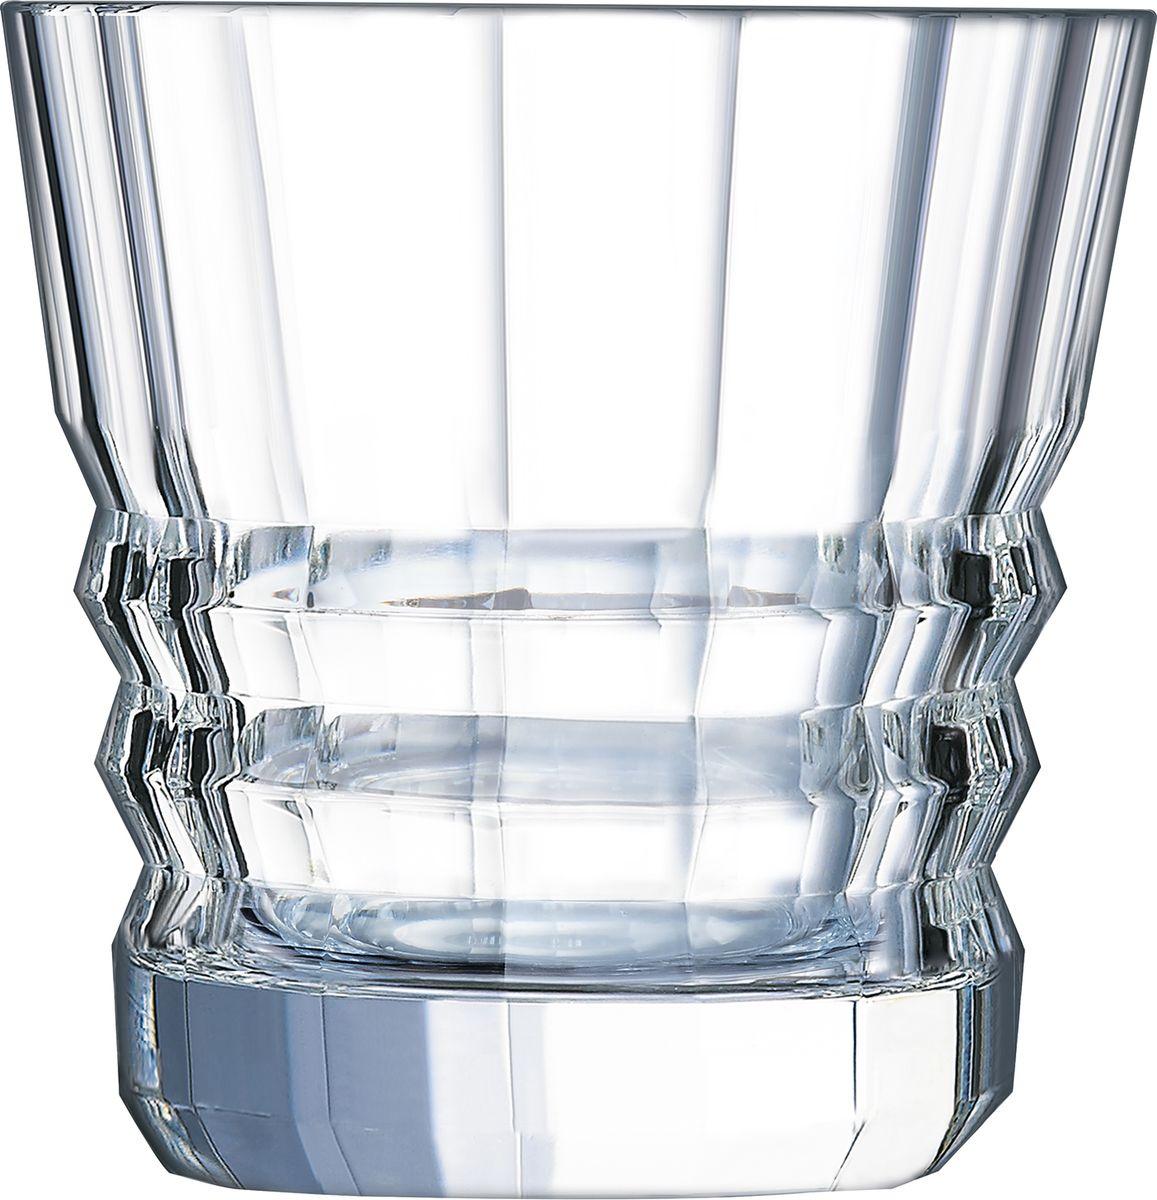 Набор стаканов Cristal d'Arques Architecte, 320 мл, 6 шт набор бокалов cristal d arques набор фужеров fleury epi cristal d arques 200мл 6 шт